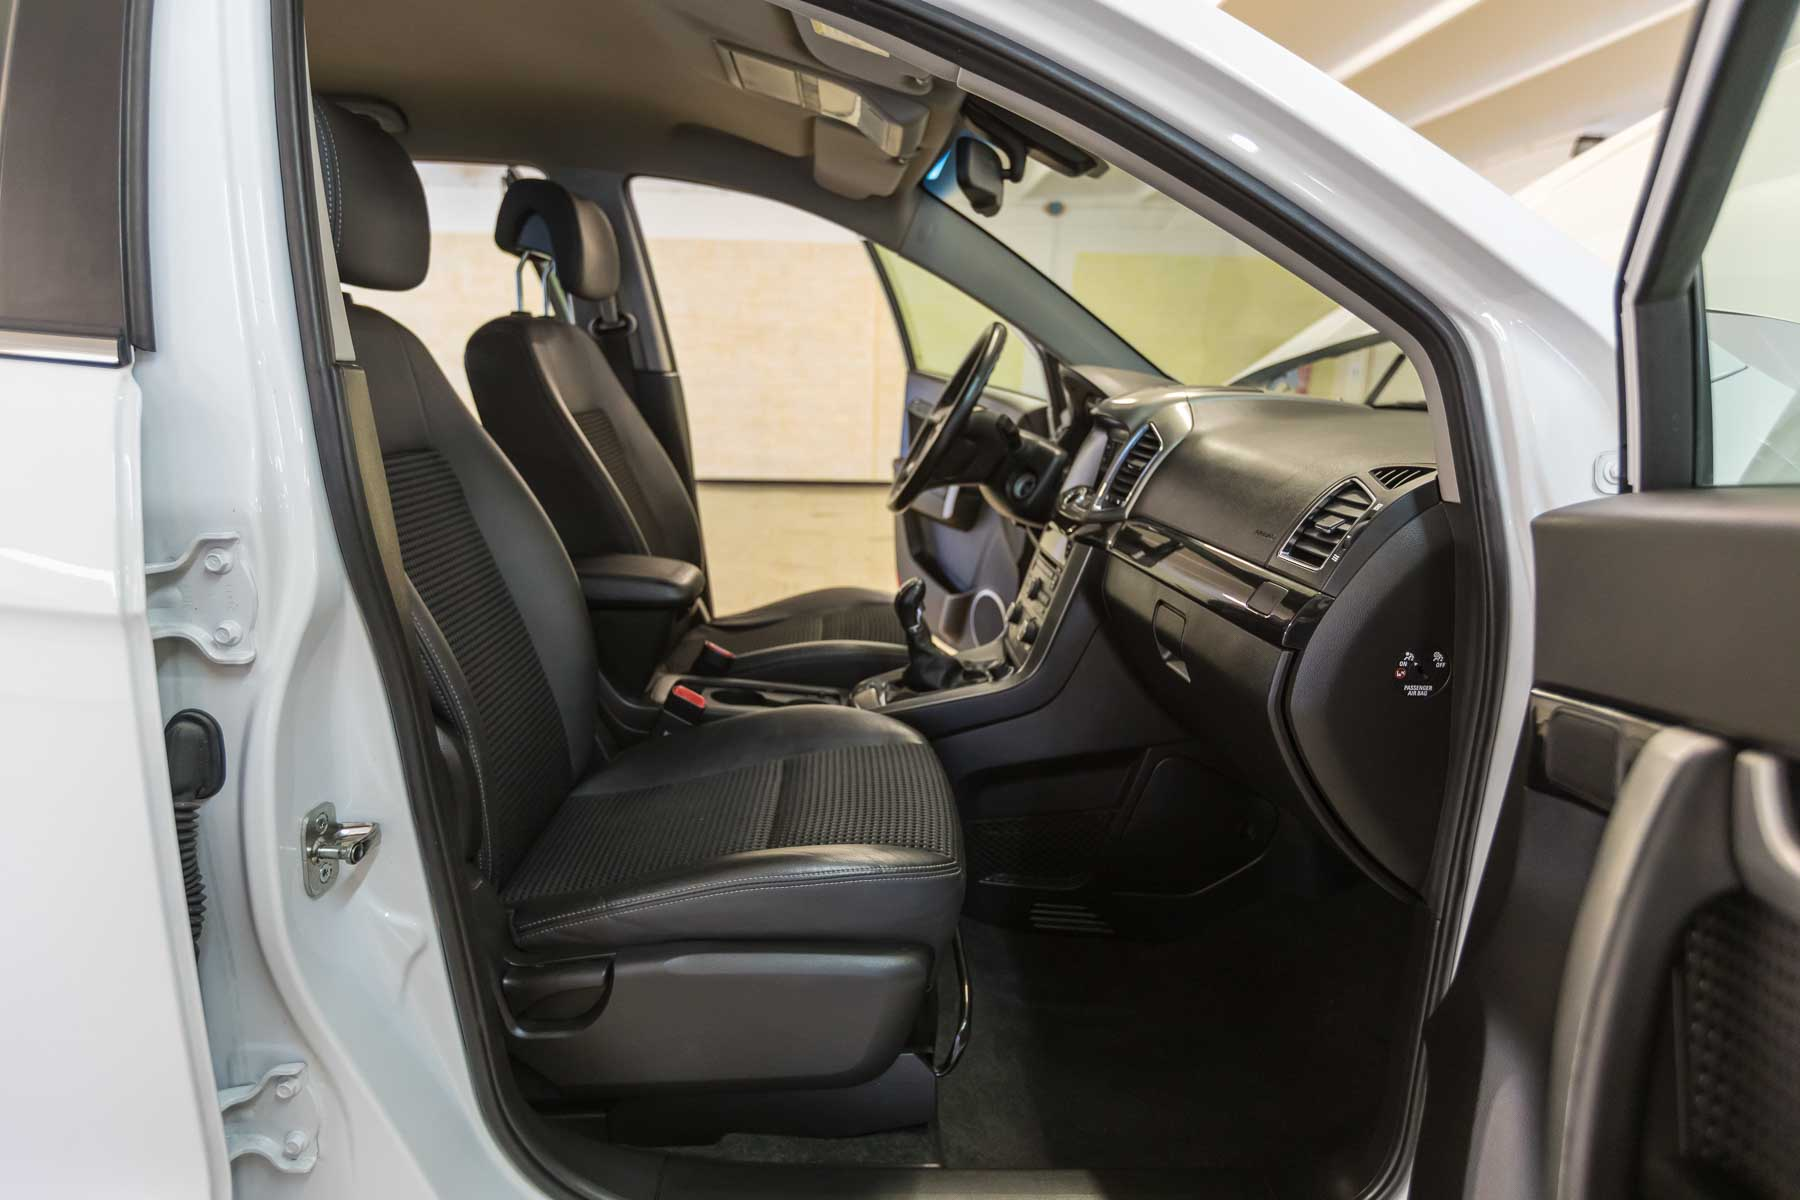 Chevrolet Interni Captiva Bianco 2wd Ls Usata Sedile Passeggero